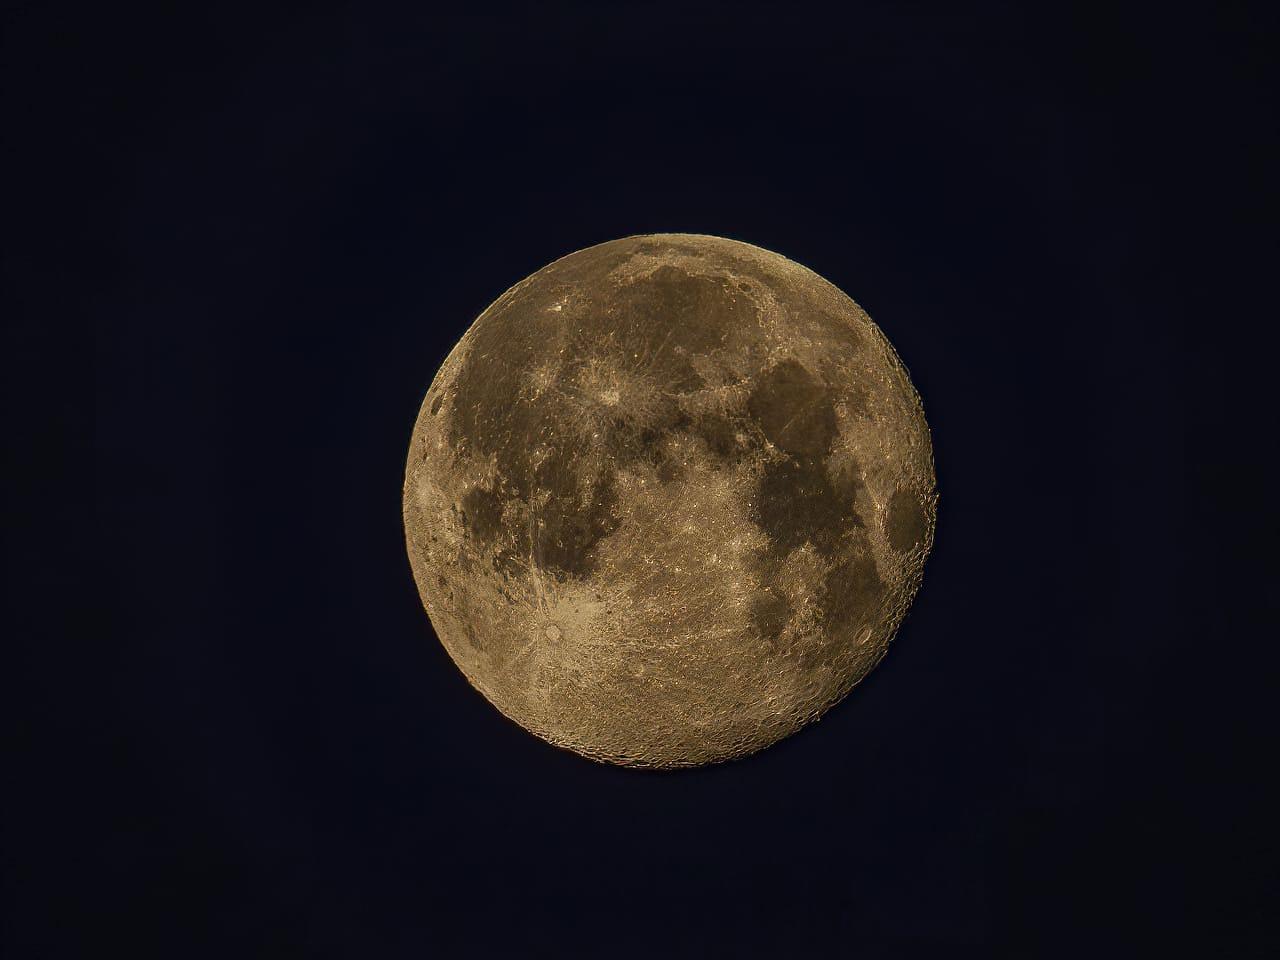 P1000 Lunar Photography 1500mm Keff Wendorff 1